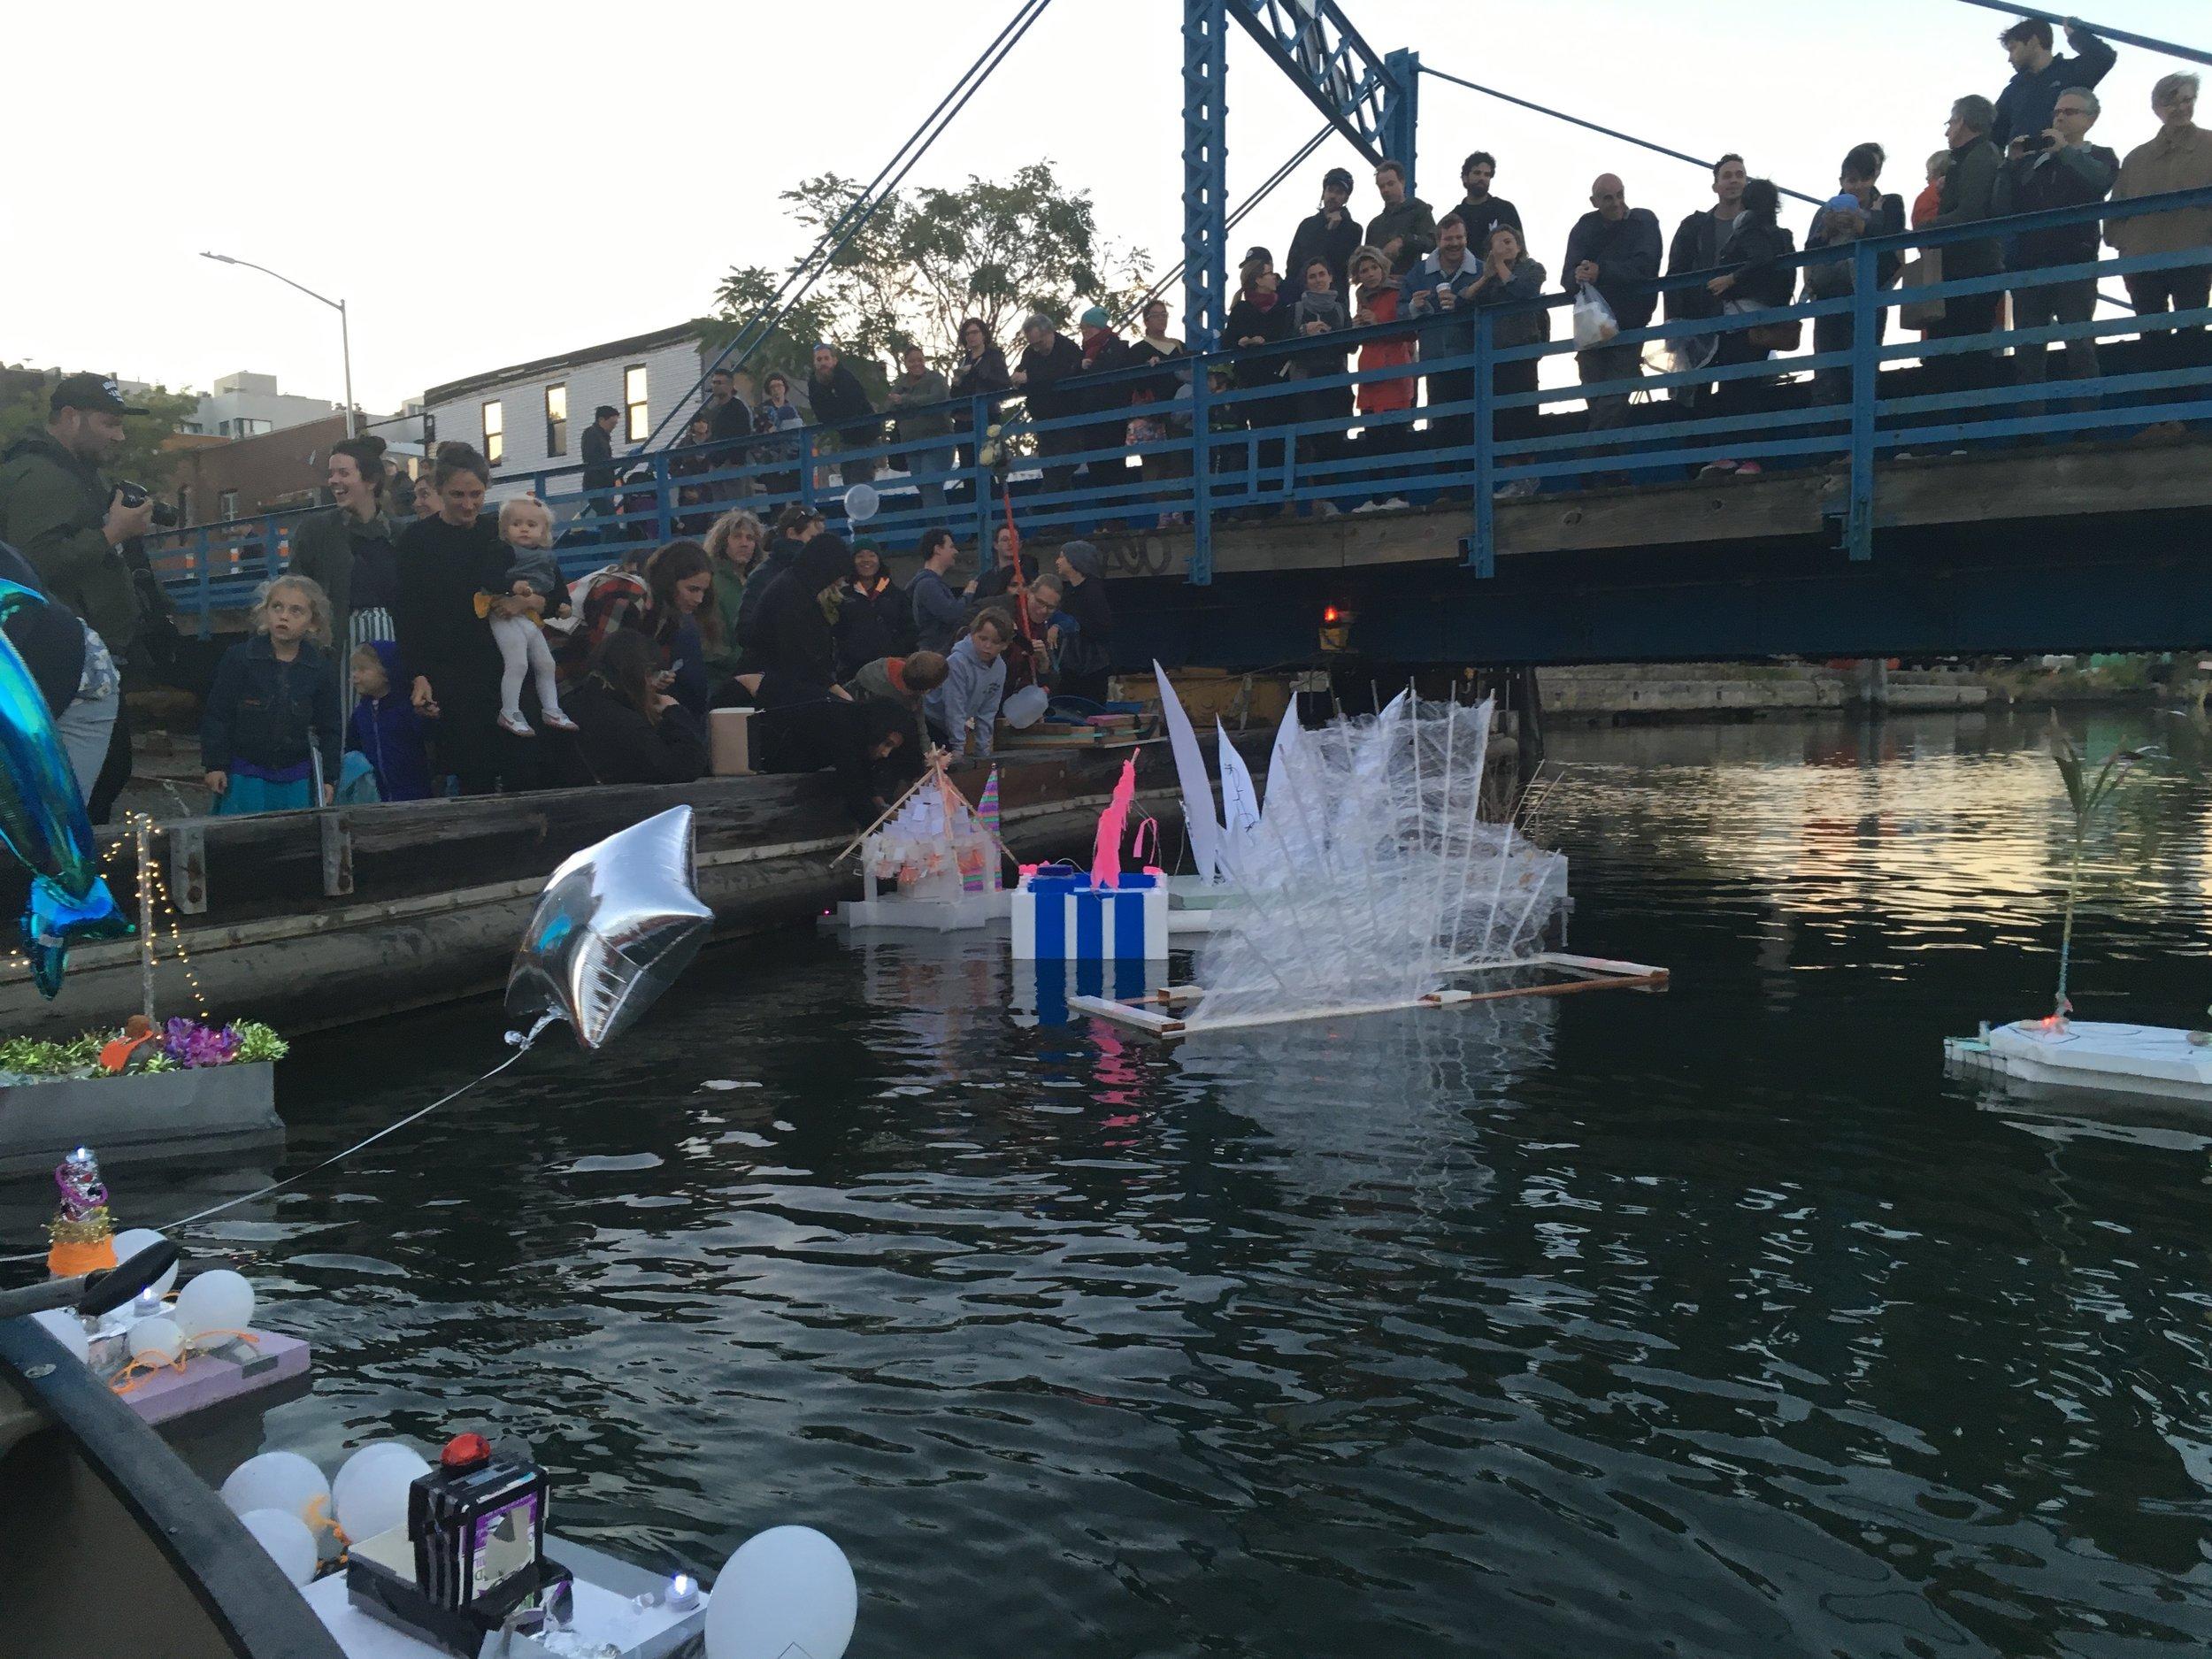 A crowd gathers on a bridge overlooking the Gowanus art flotilla.